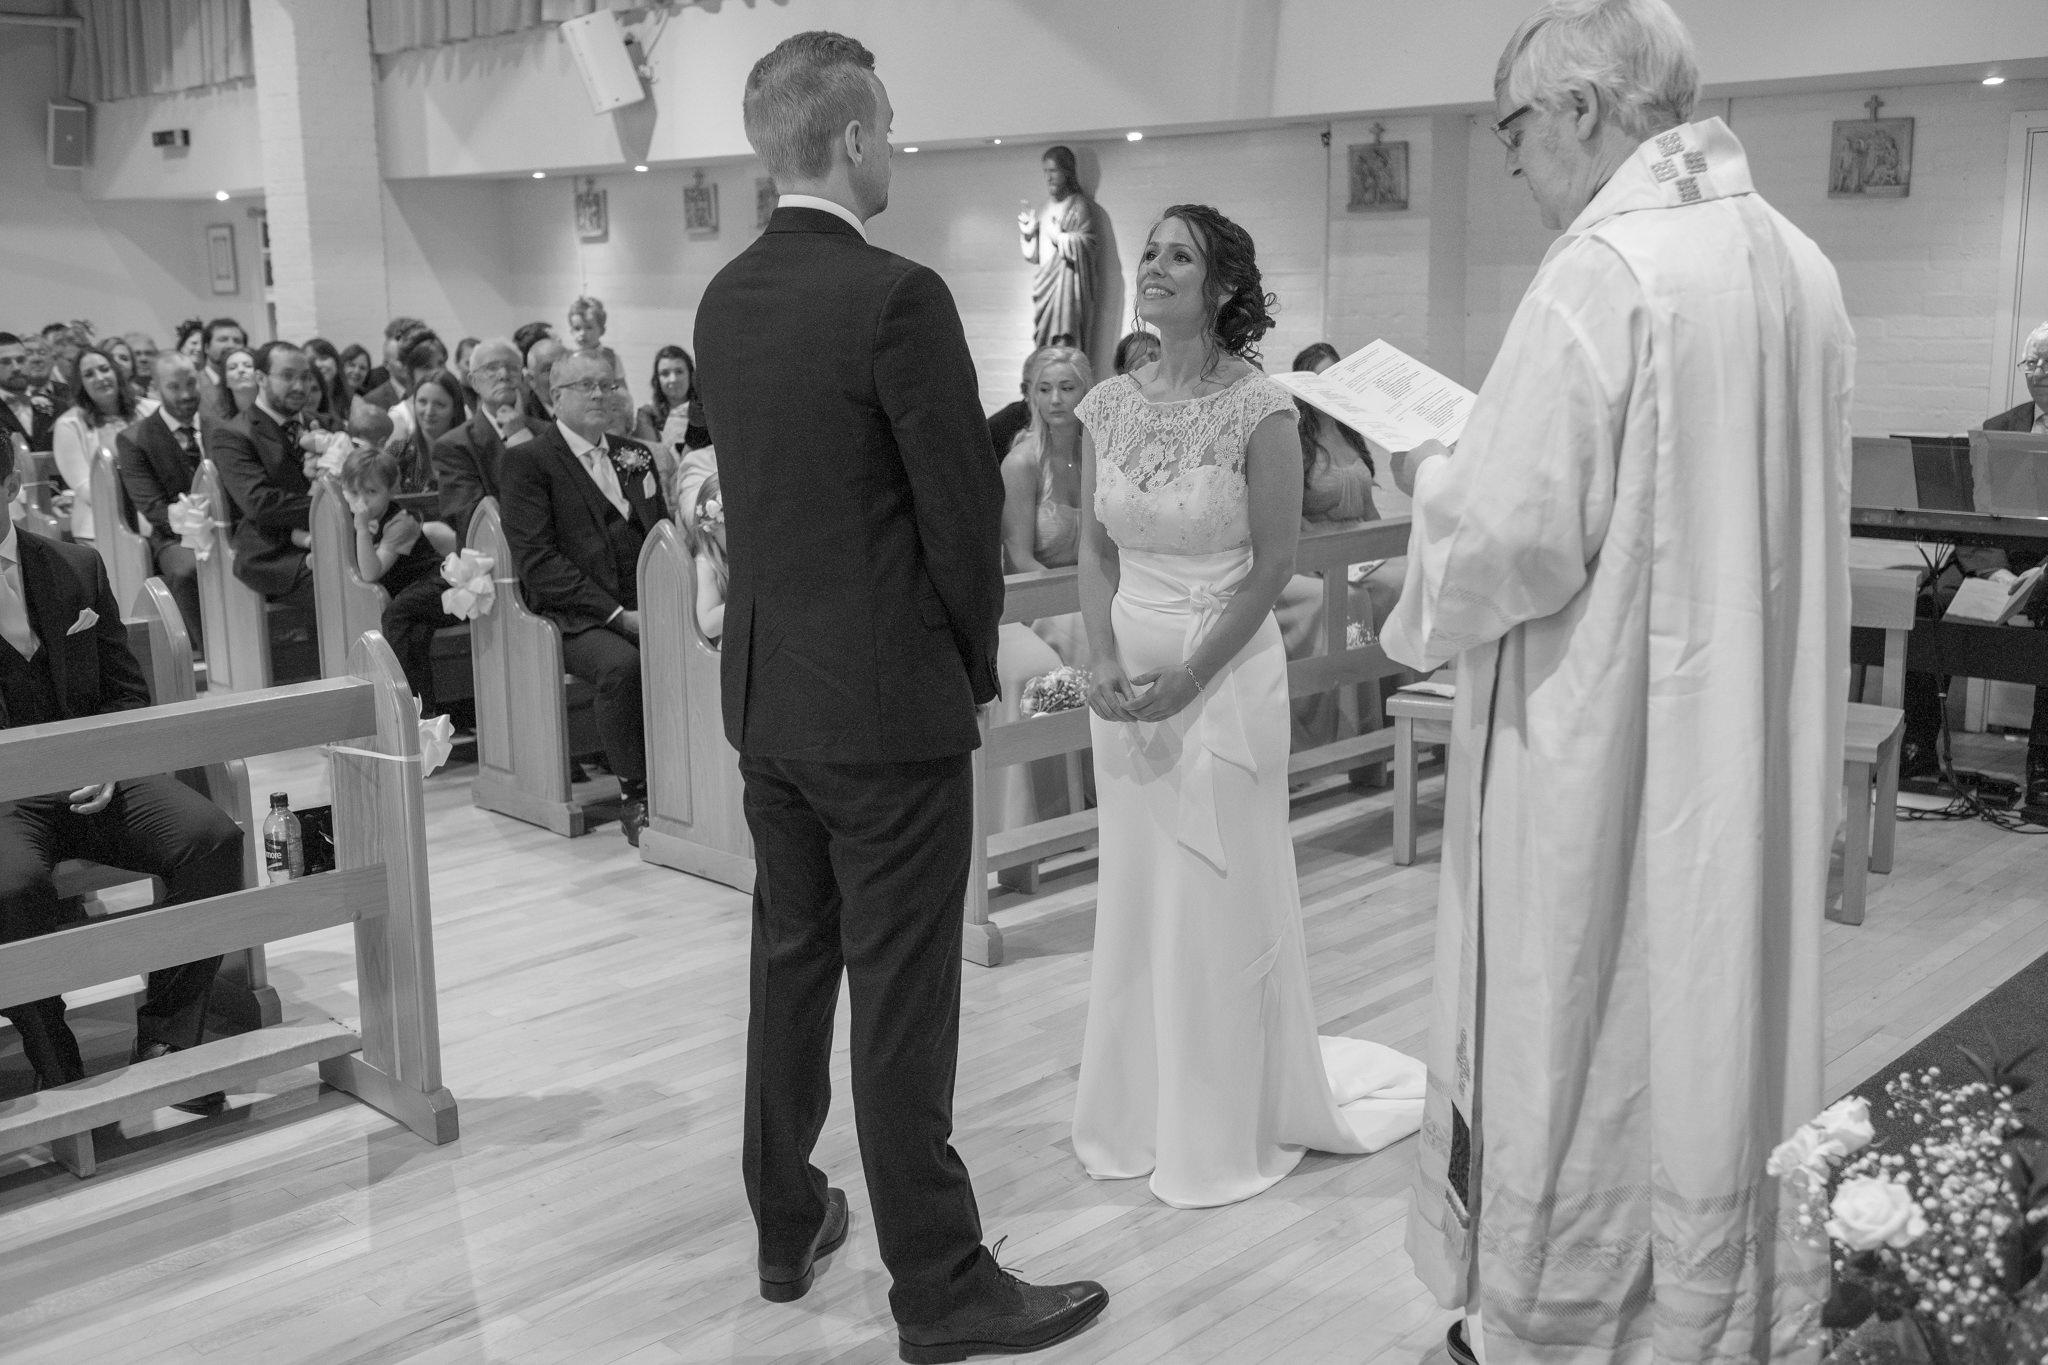 Woldingham School Wedding - Robin Ball Photography - Kate and Lee-015.jpg